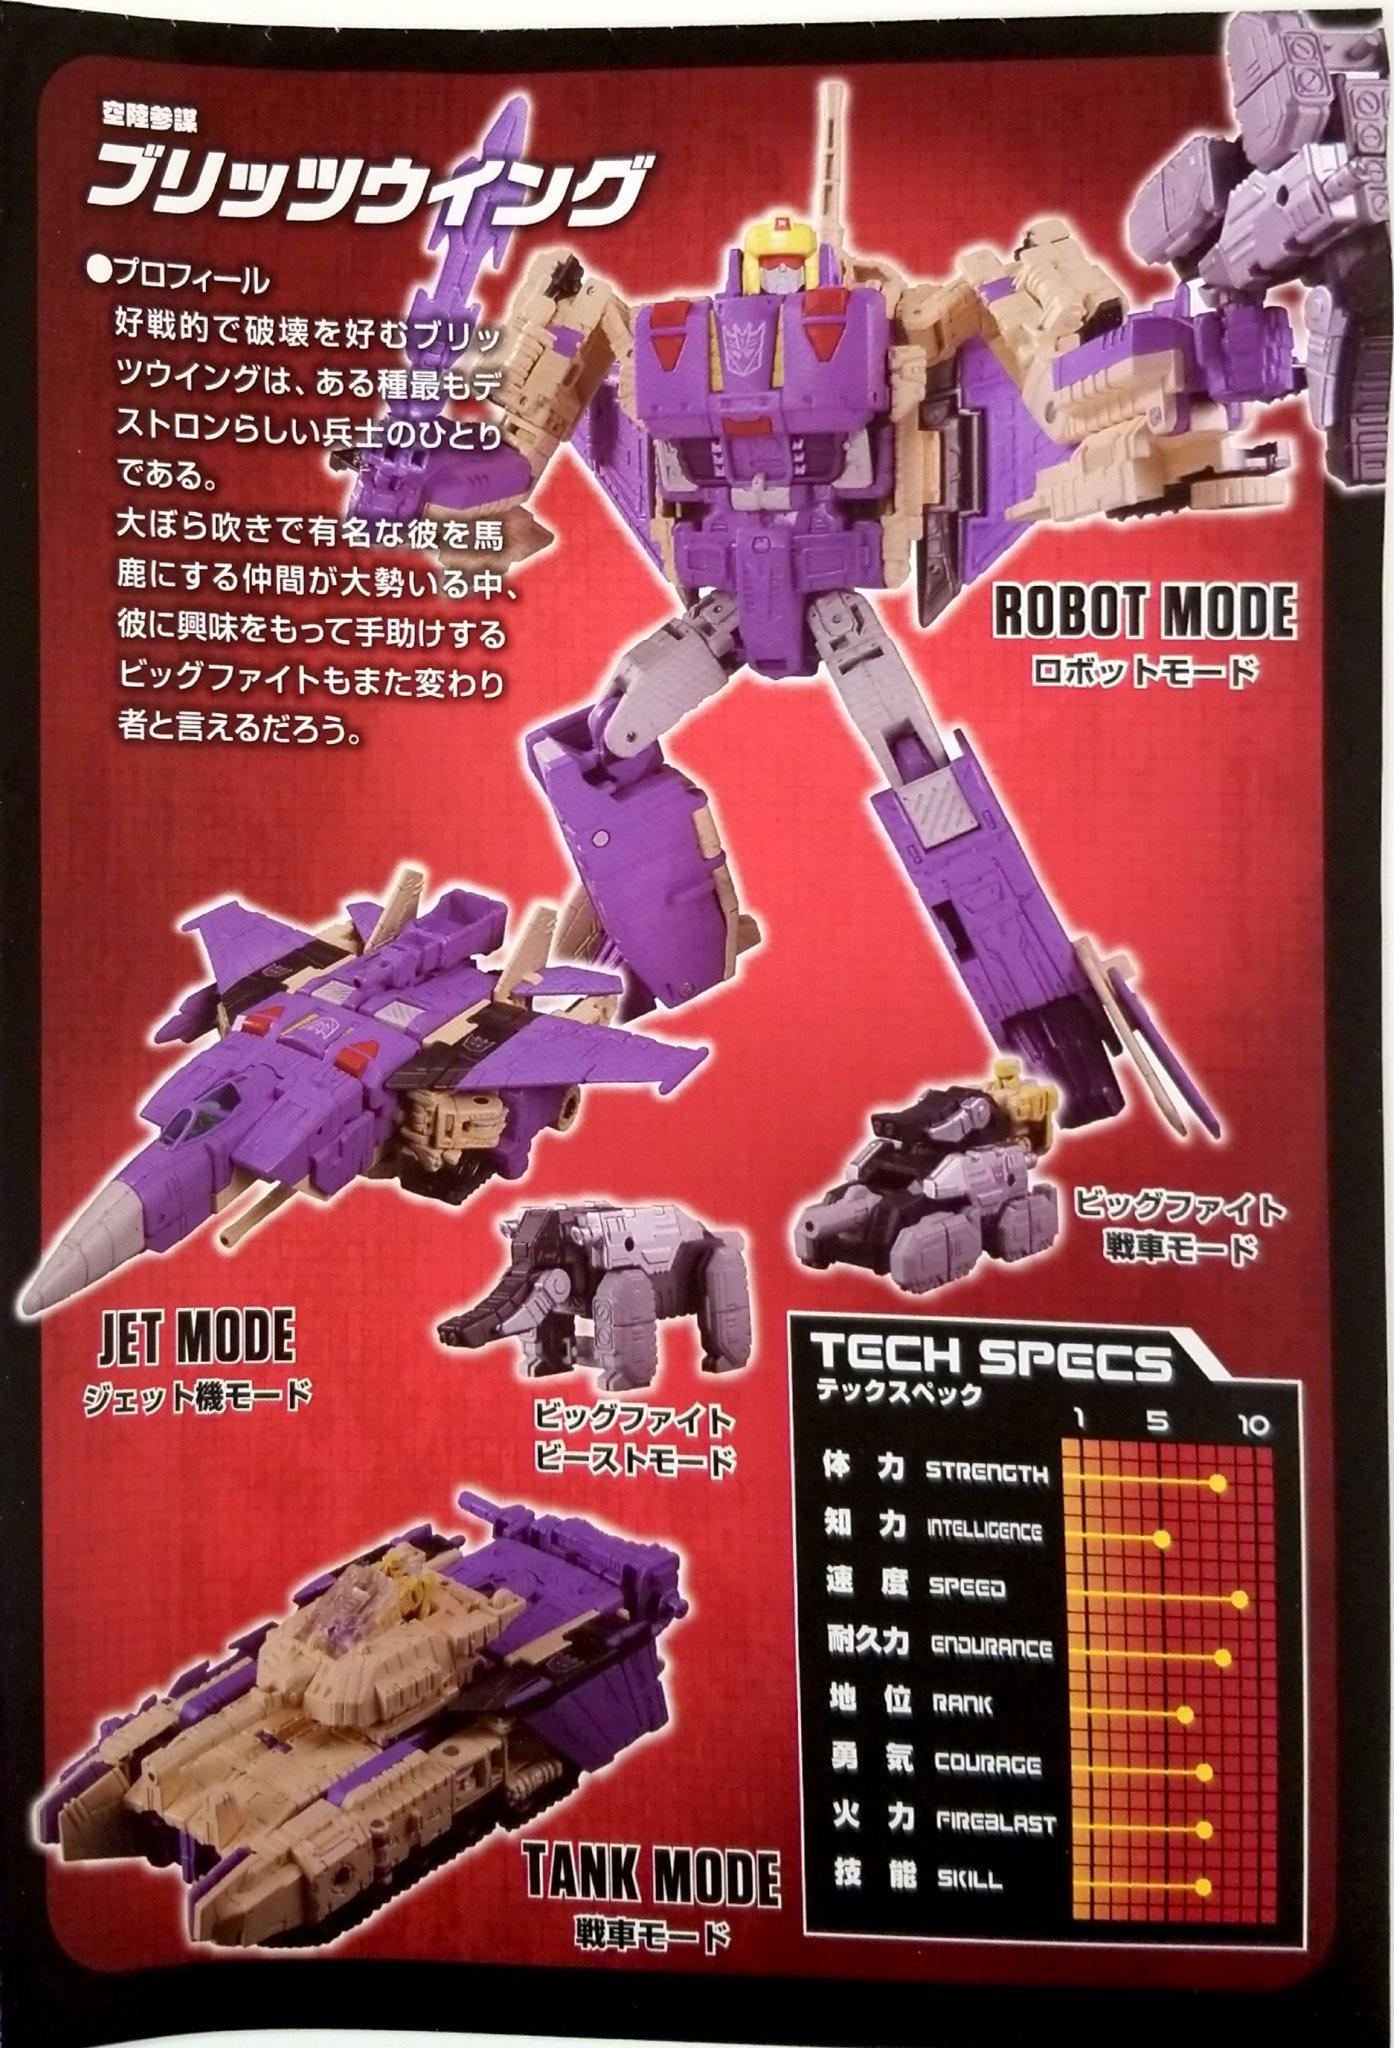 Transformers Takara Tomy LG-59 Blitzwing